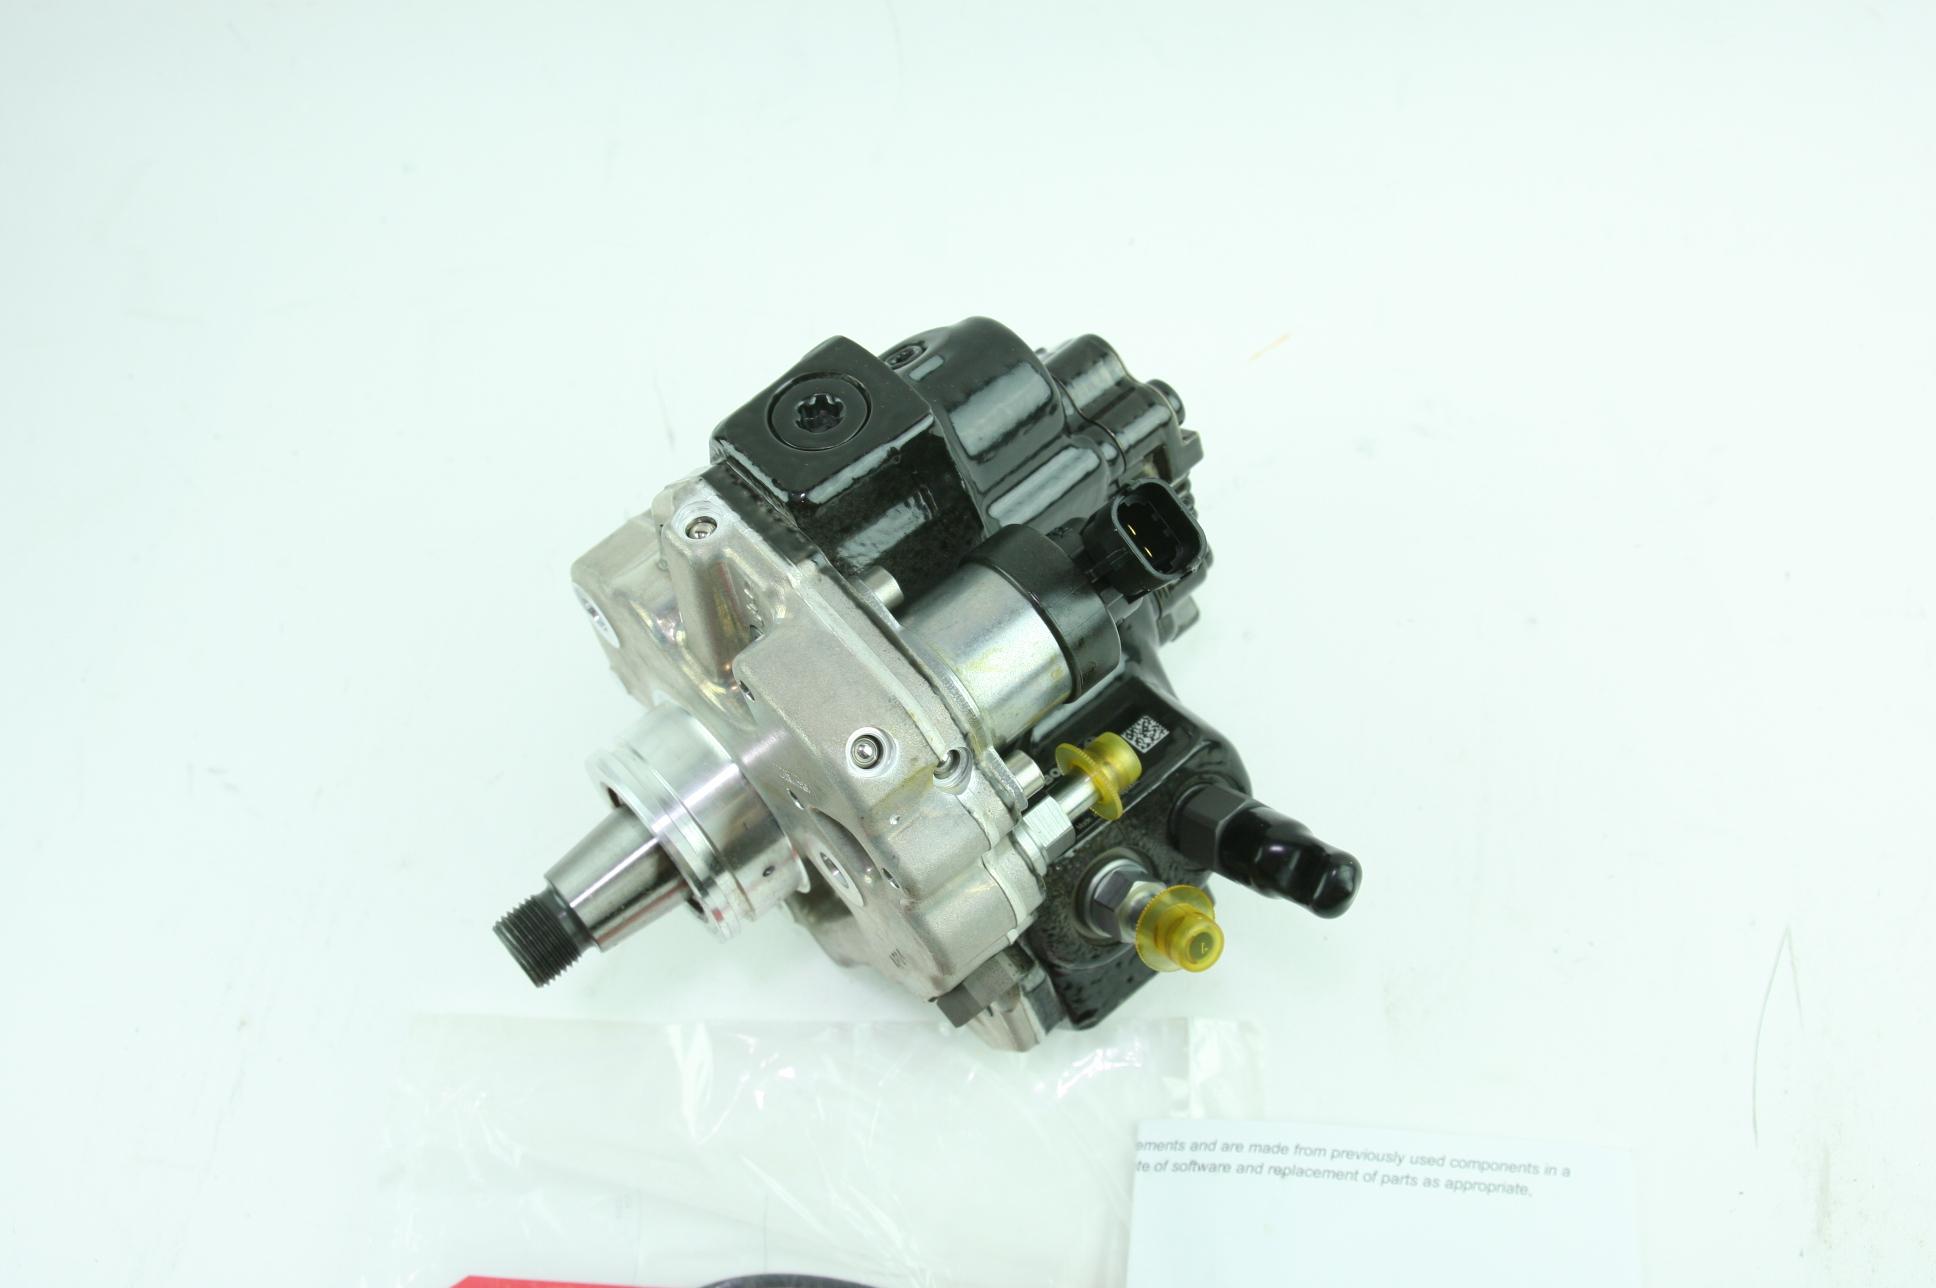 New Genuine OEM GM 97780161 Reman Injection Pump w/ Regulator 06-10 Duramax 6.6 - image 3